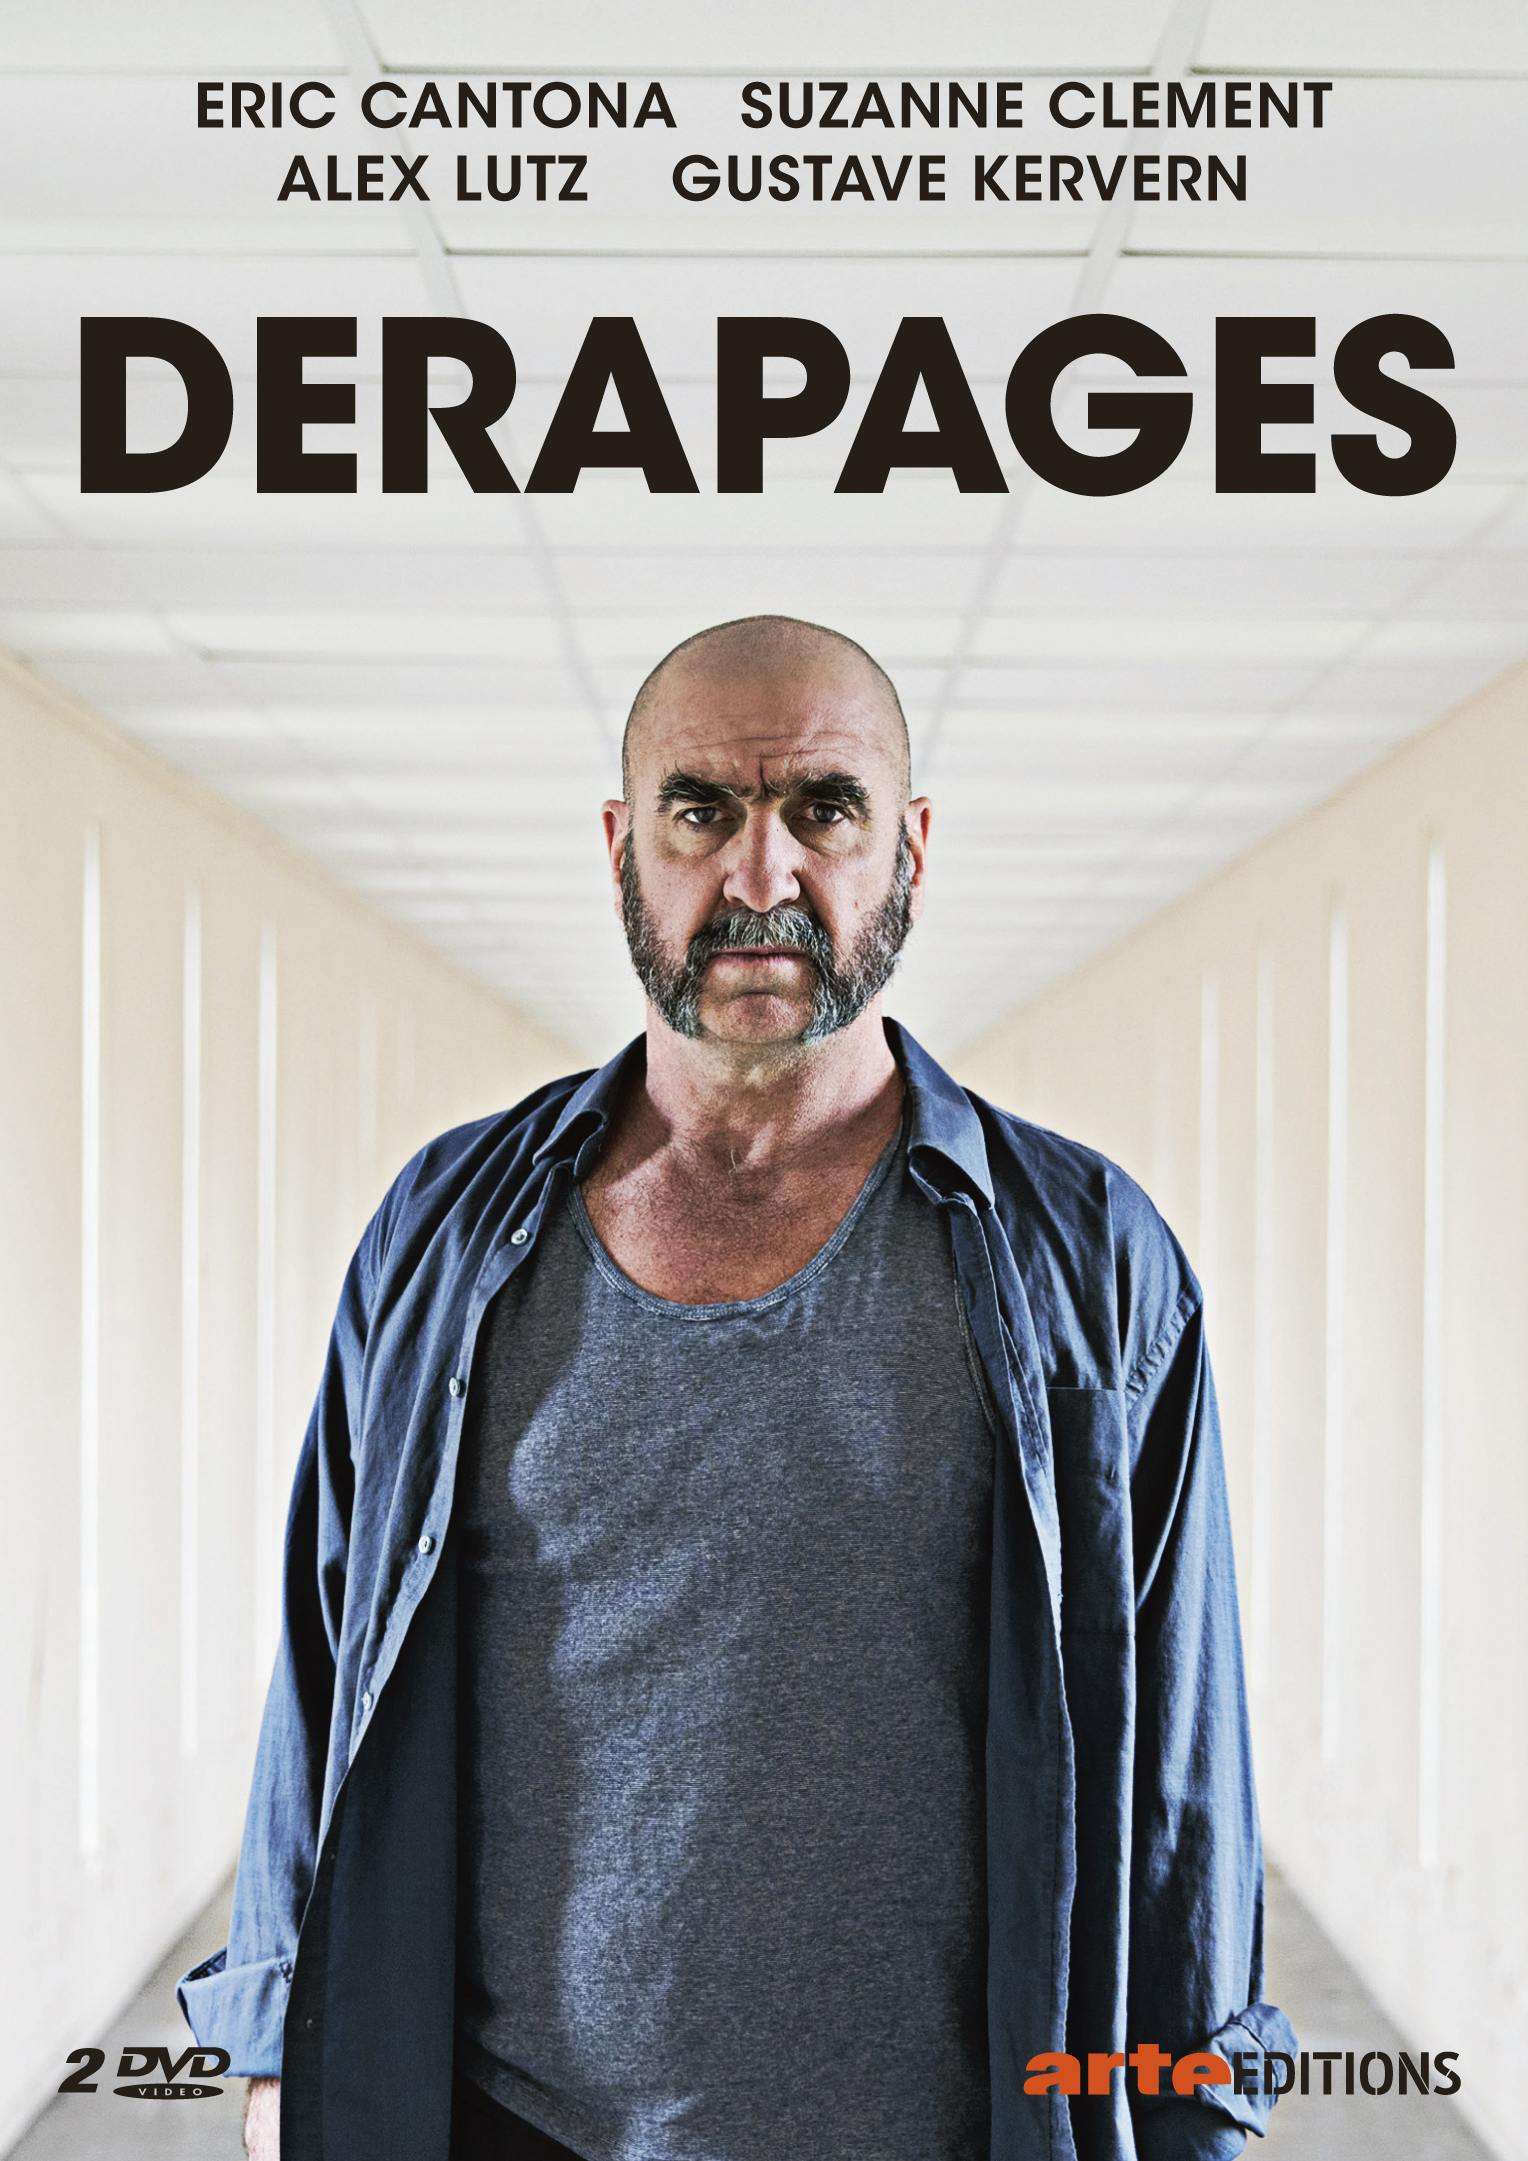 Derapages - 2 dvd